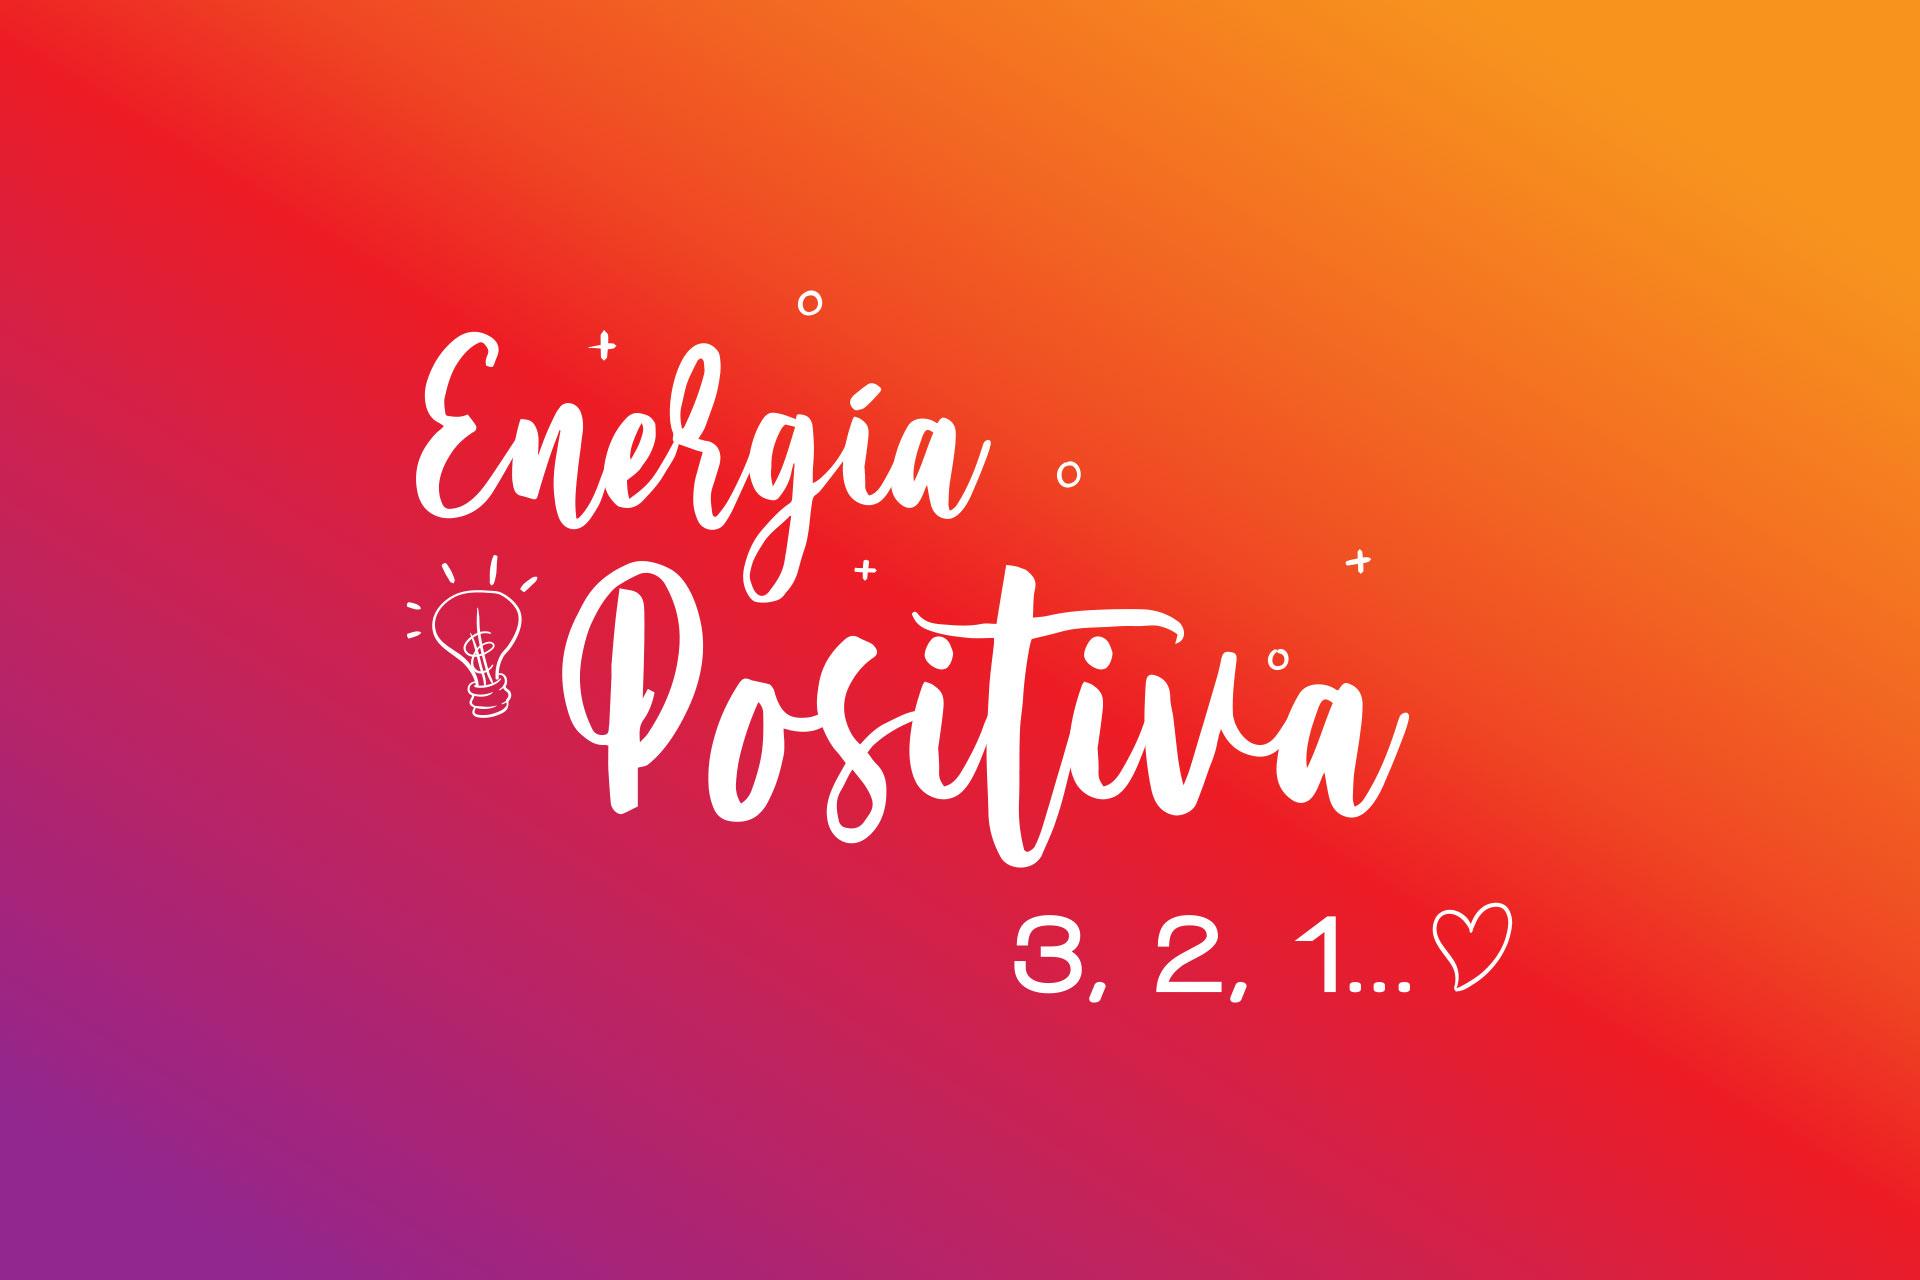 21 Días de Energía Positiva